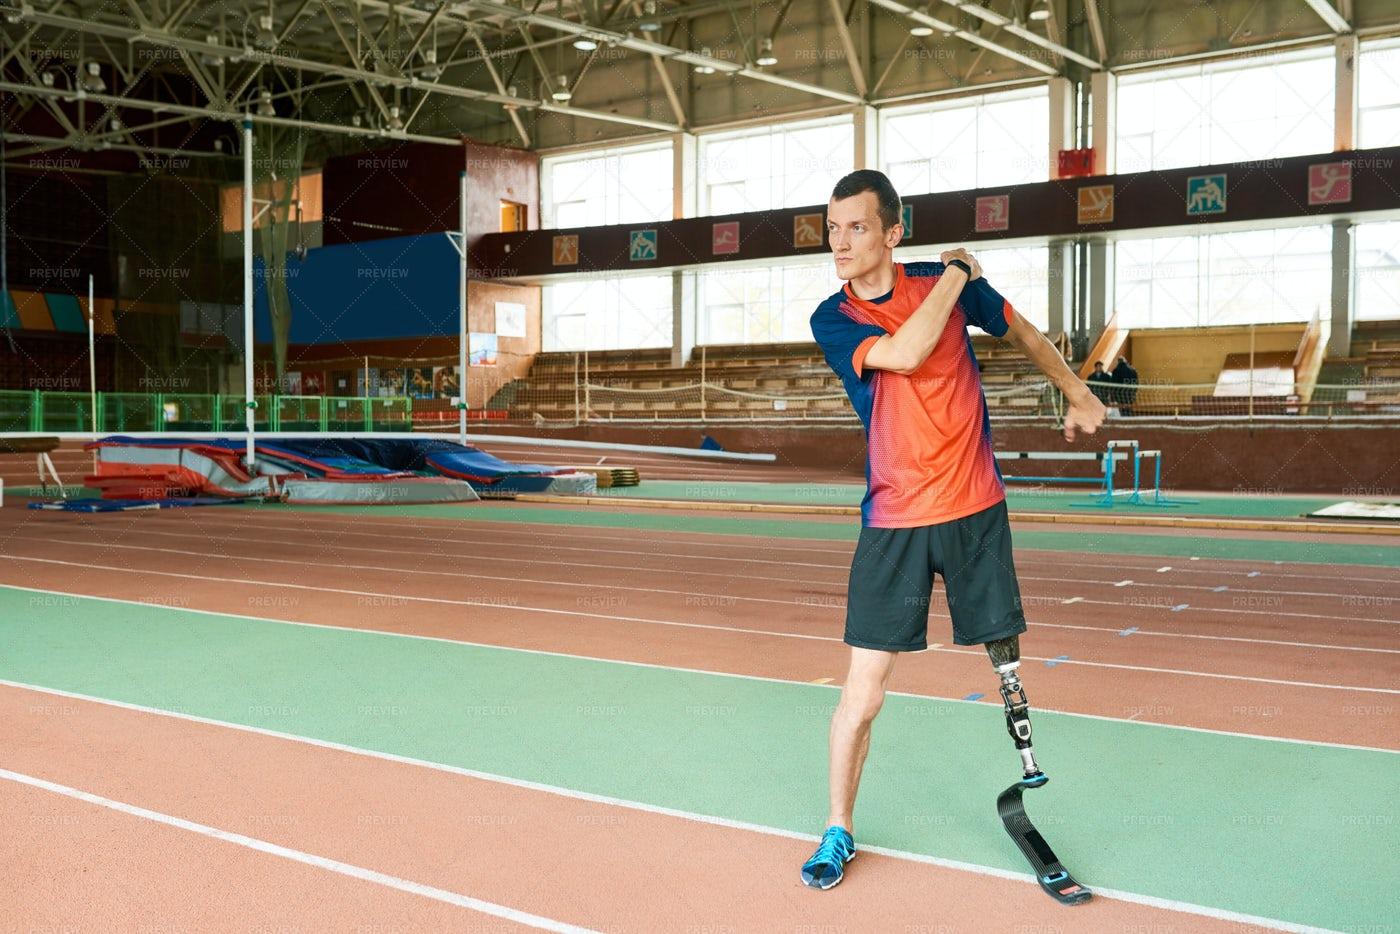 Adaptive Athlete Ready For Training: Stock Photos